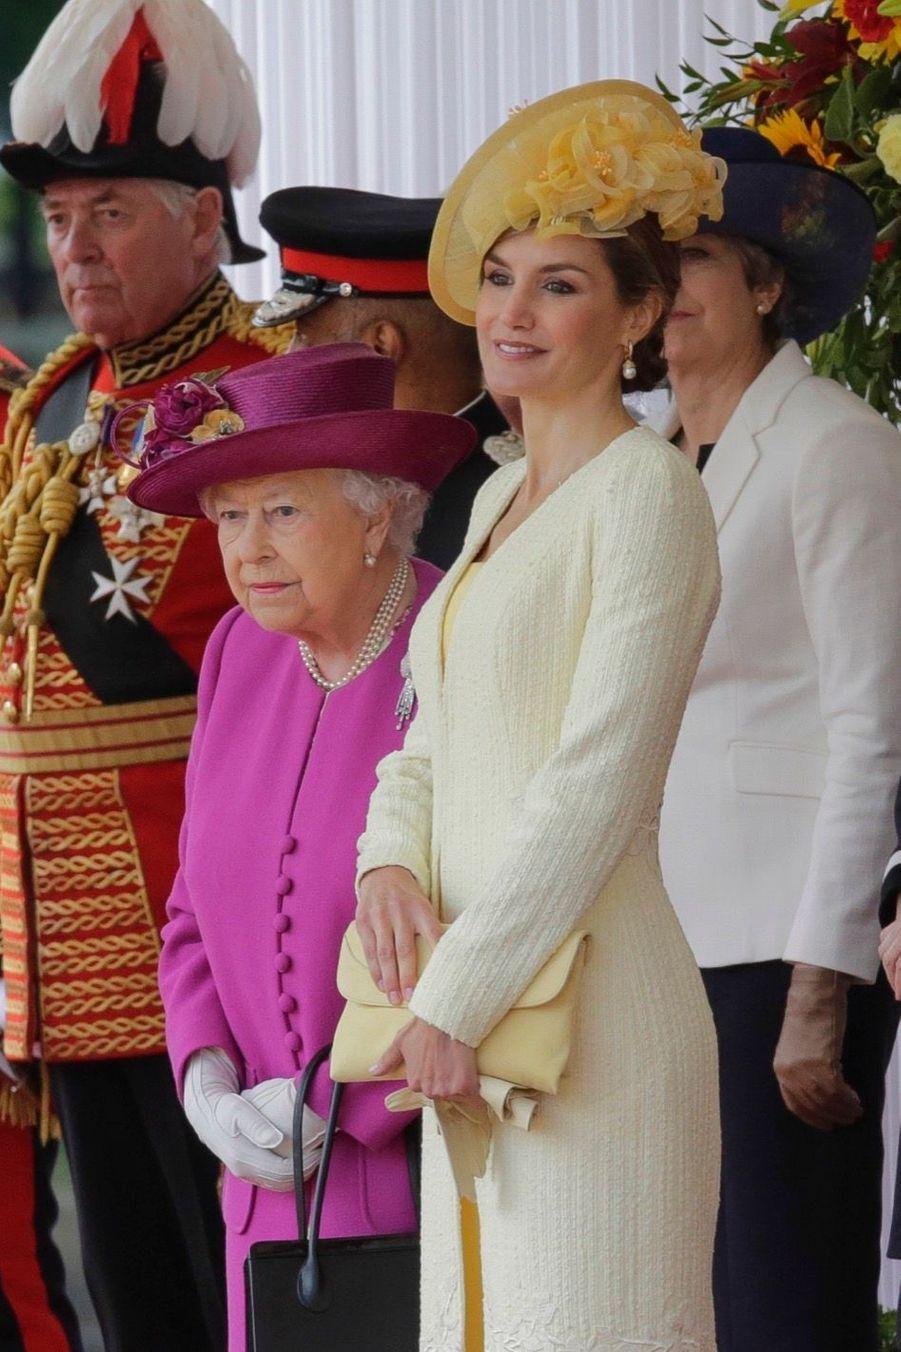 Letizia Et Felipe En Visite Chez La Reine Elizabeth II 21